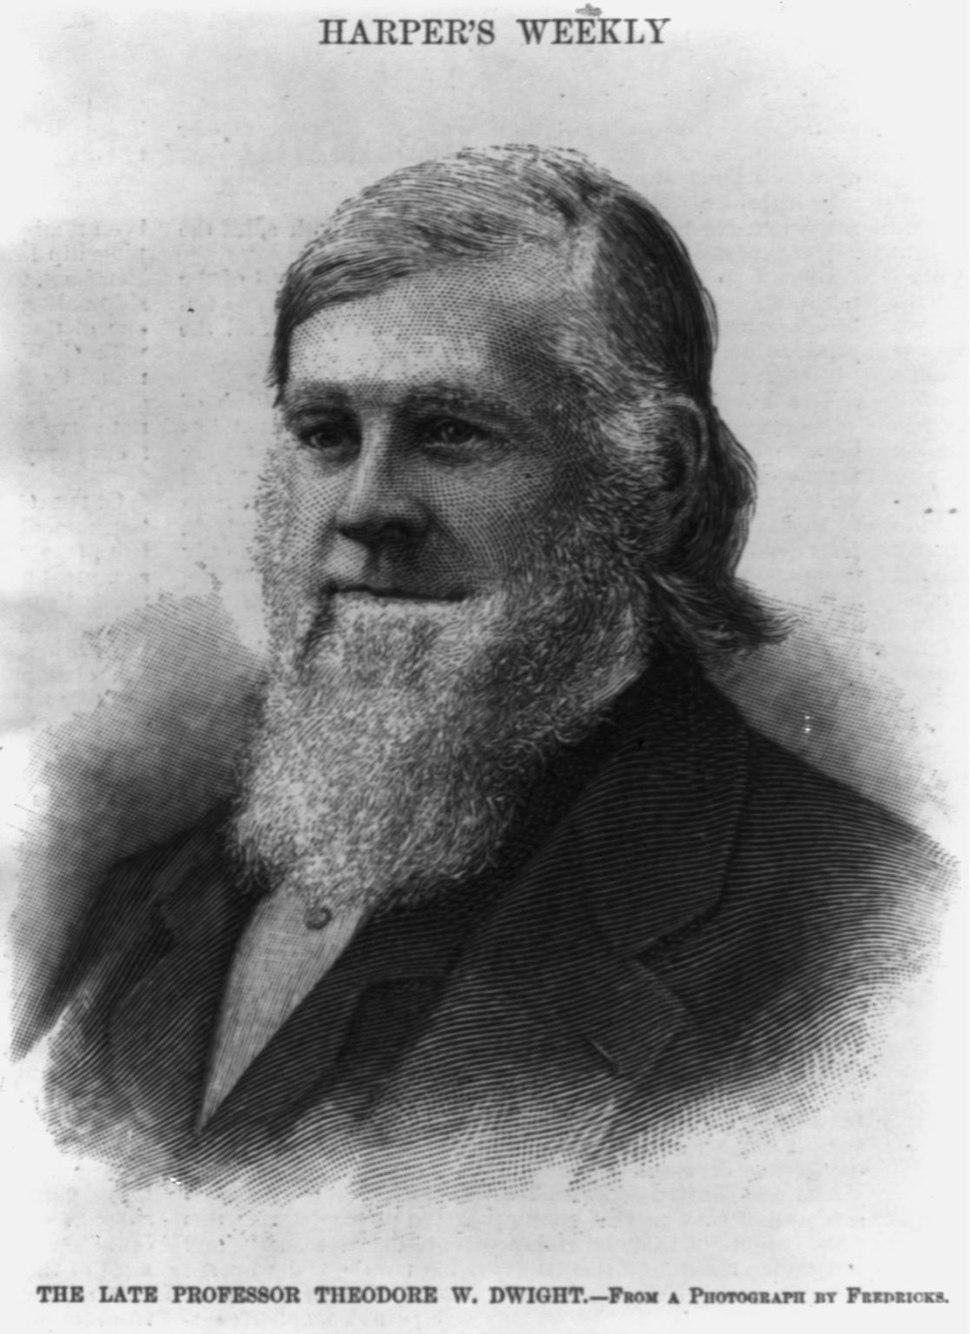 Theodore W. Dwight cph.3b29639